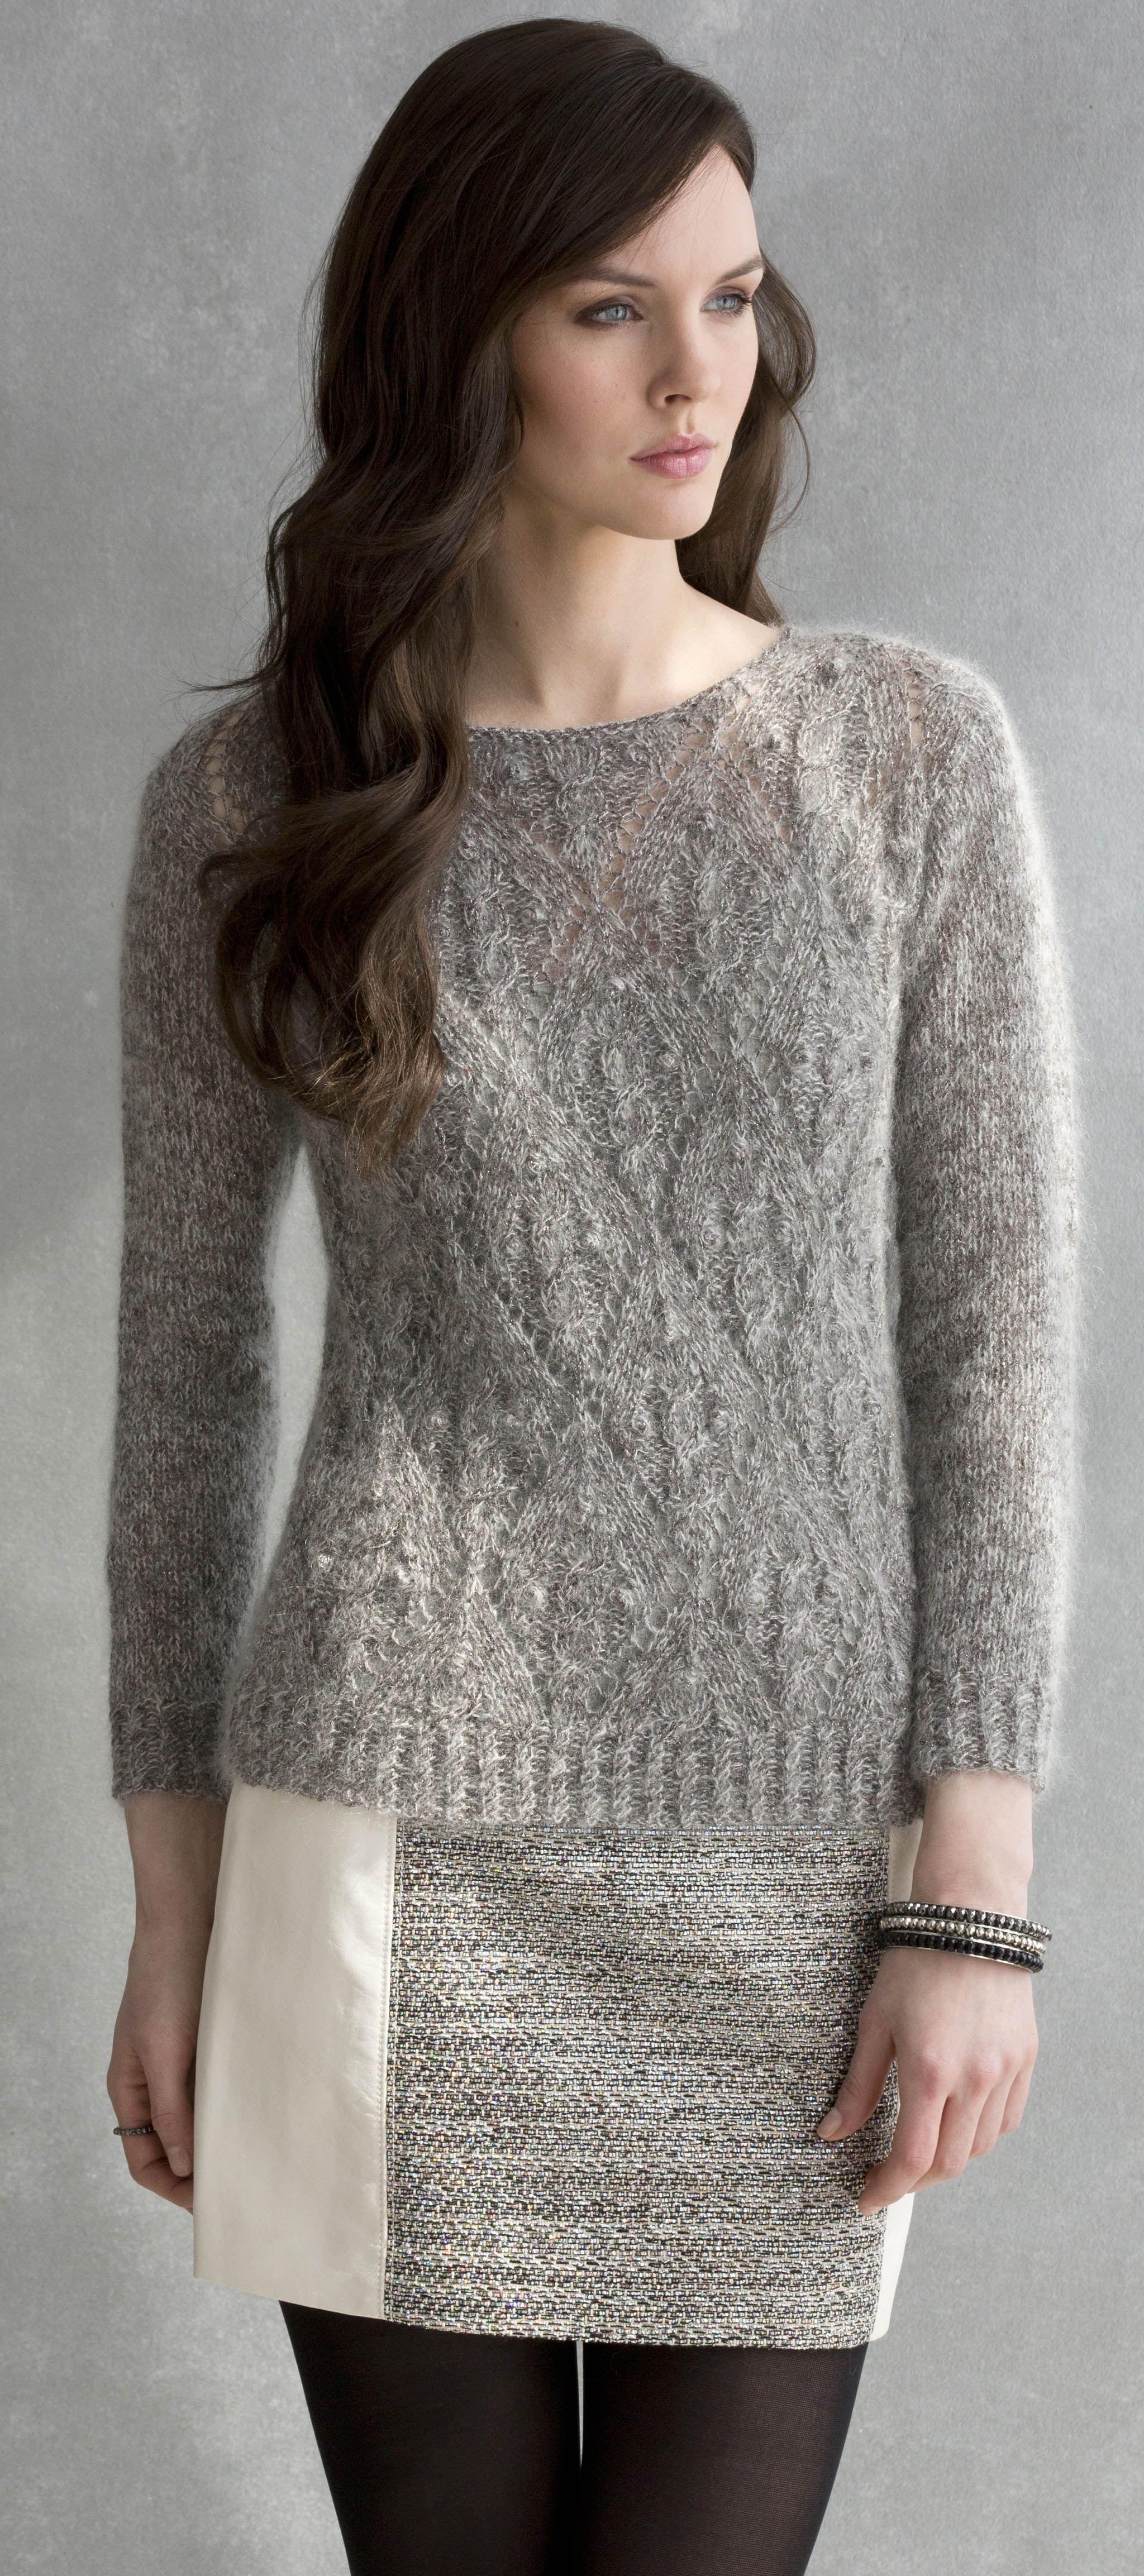 Ivie Pullover in CELINE & LUNA http://tahkistacycharles.com/t ...